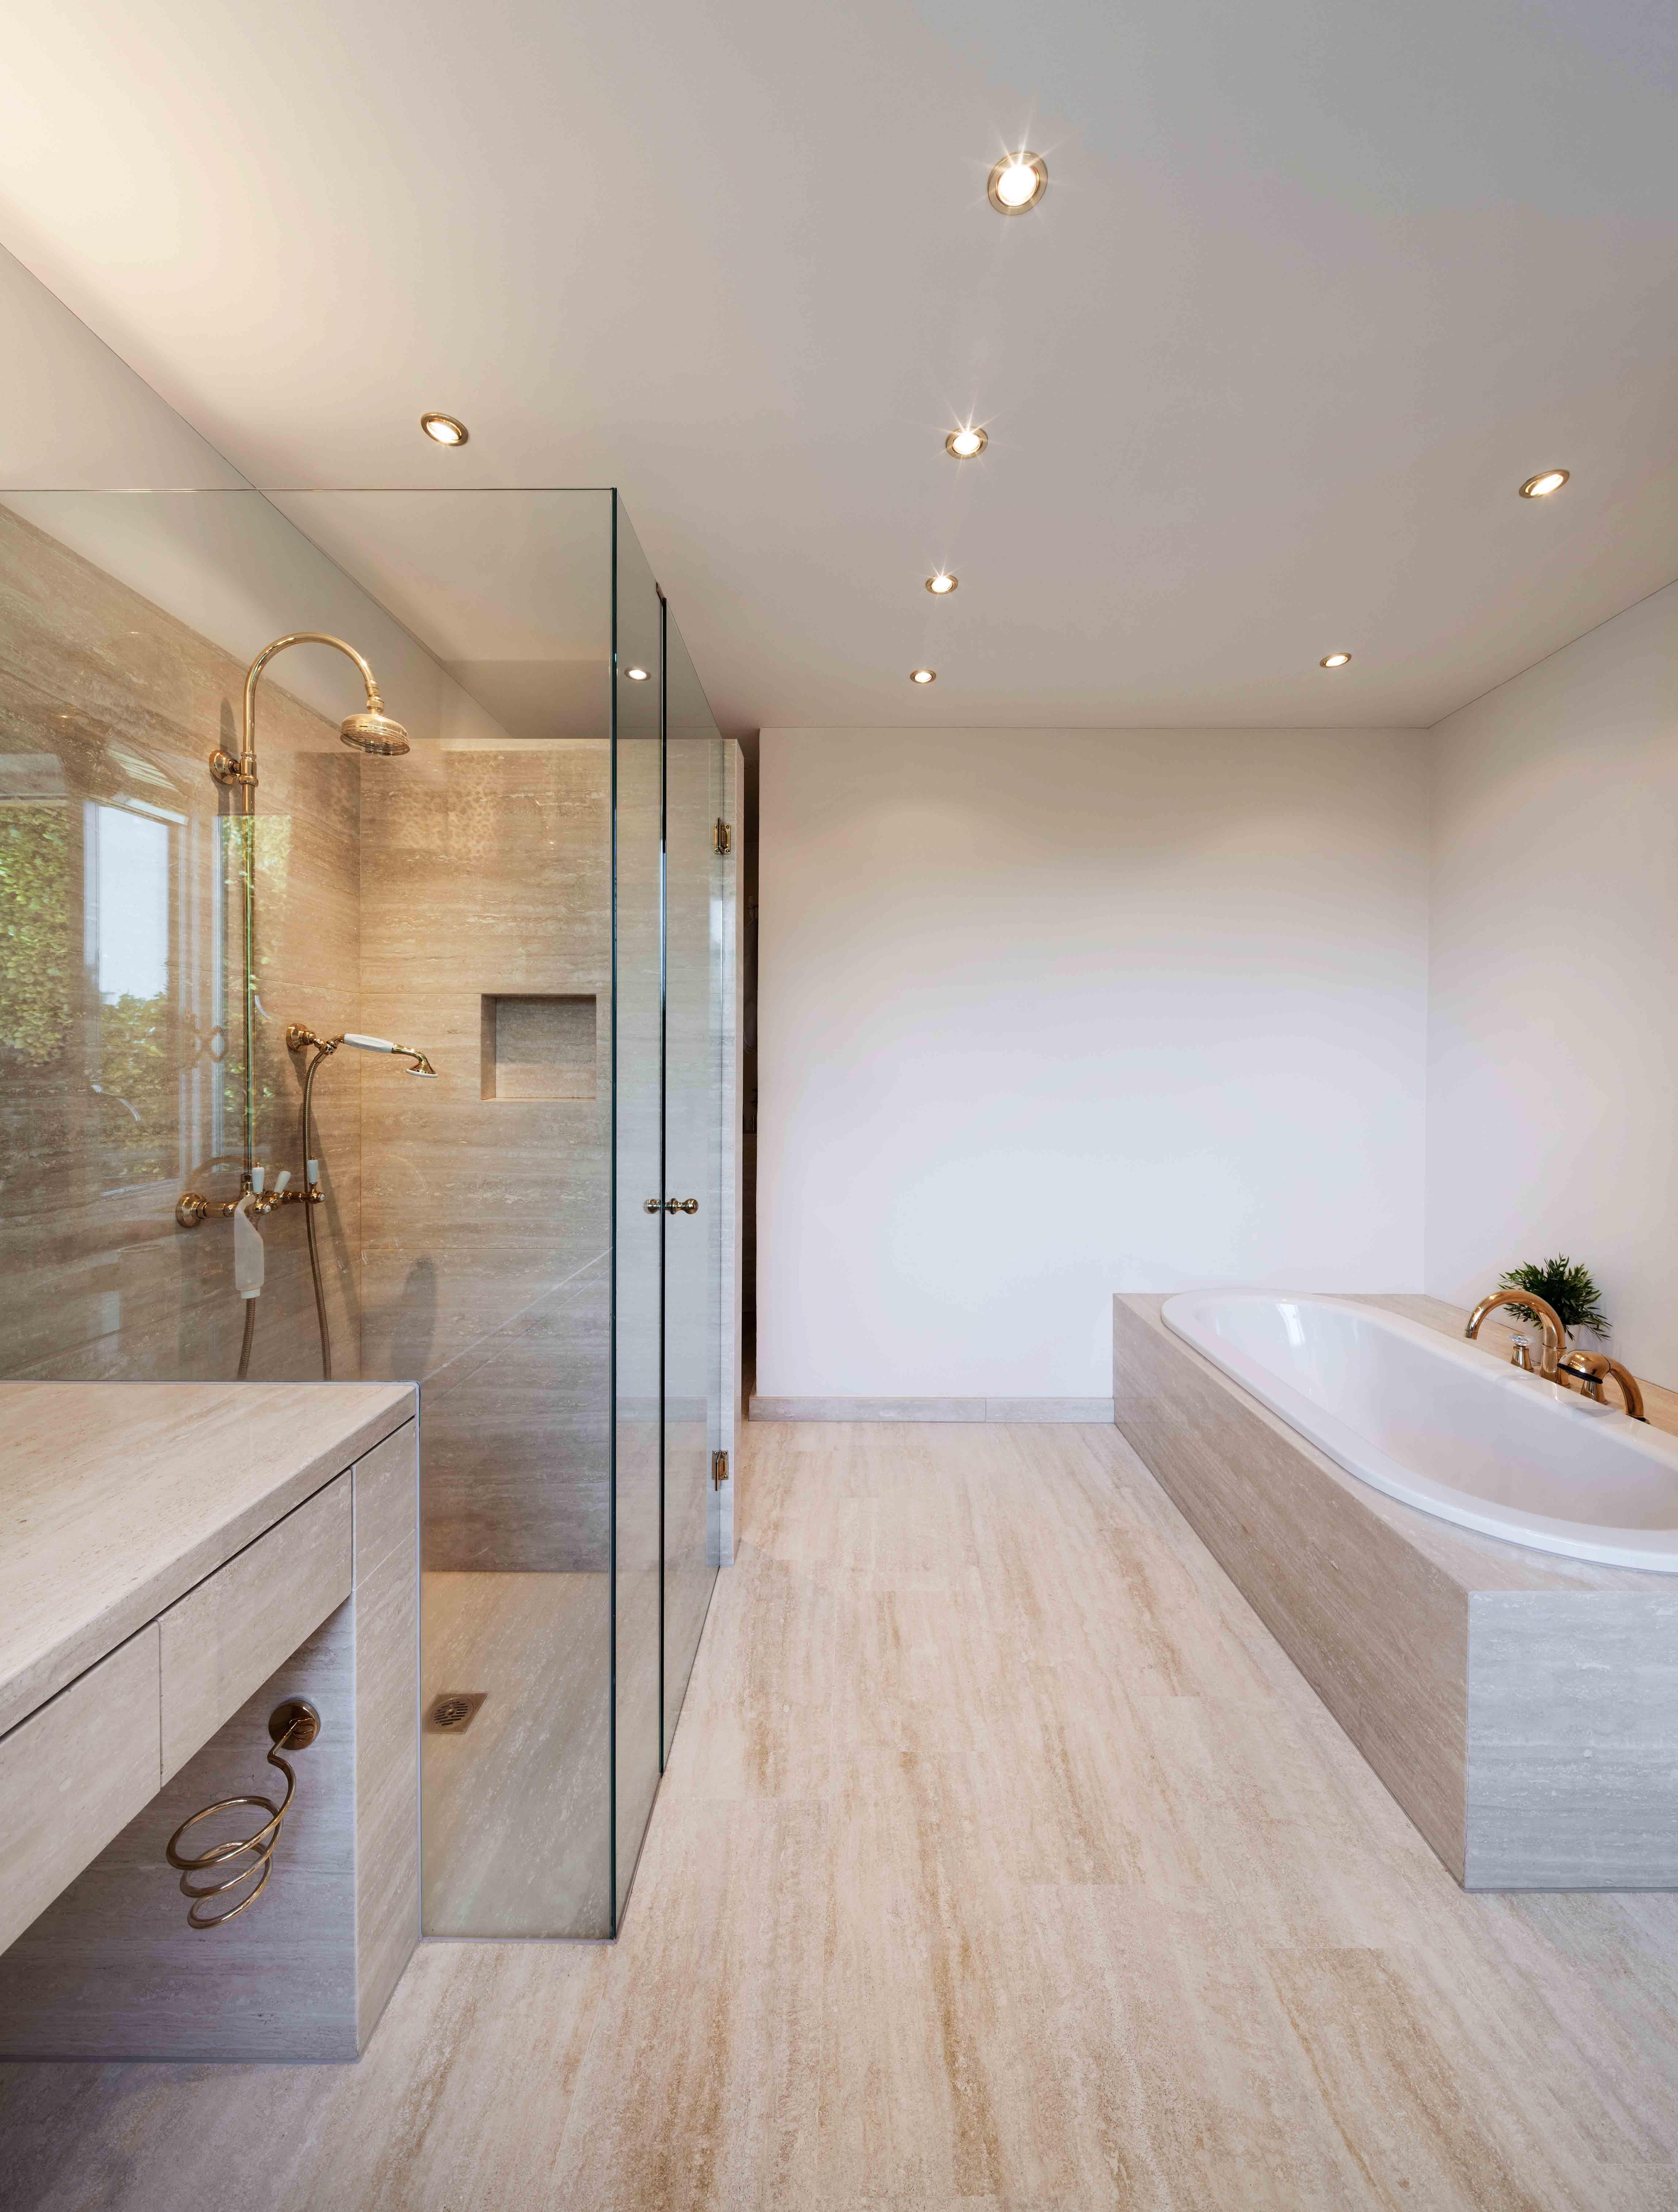 Design Bad Lampen Bathroom Interior Bathroom Interior Design